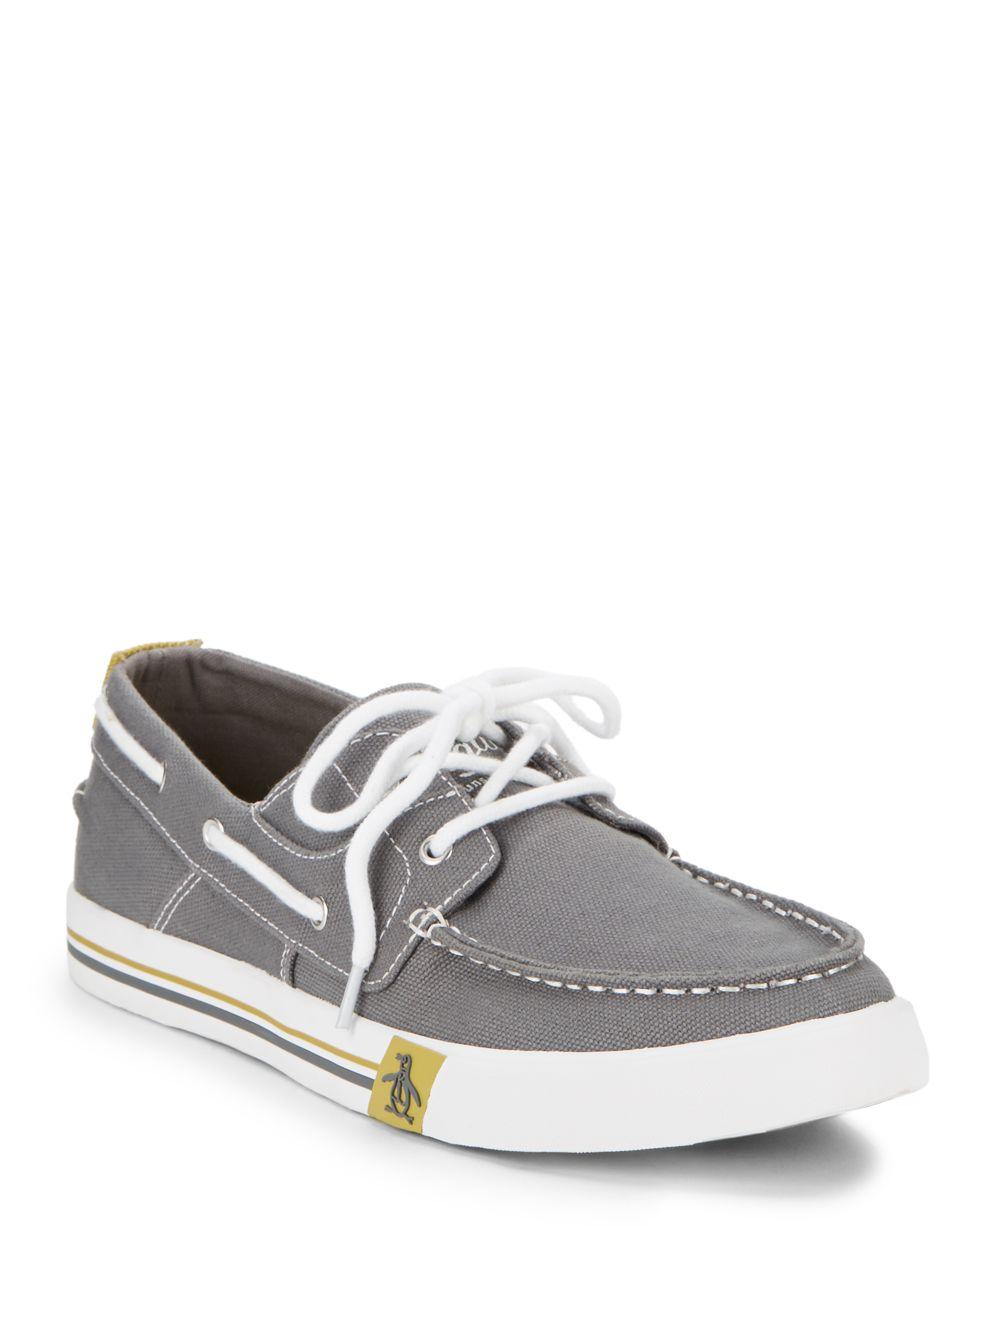 Chaussures Bateau Pingouin Originaux En Blanc - Blanc GQiAe3j